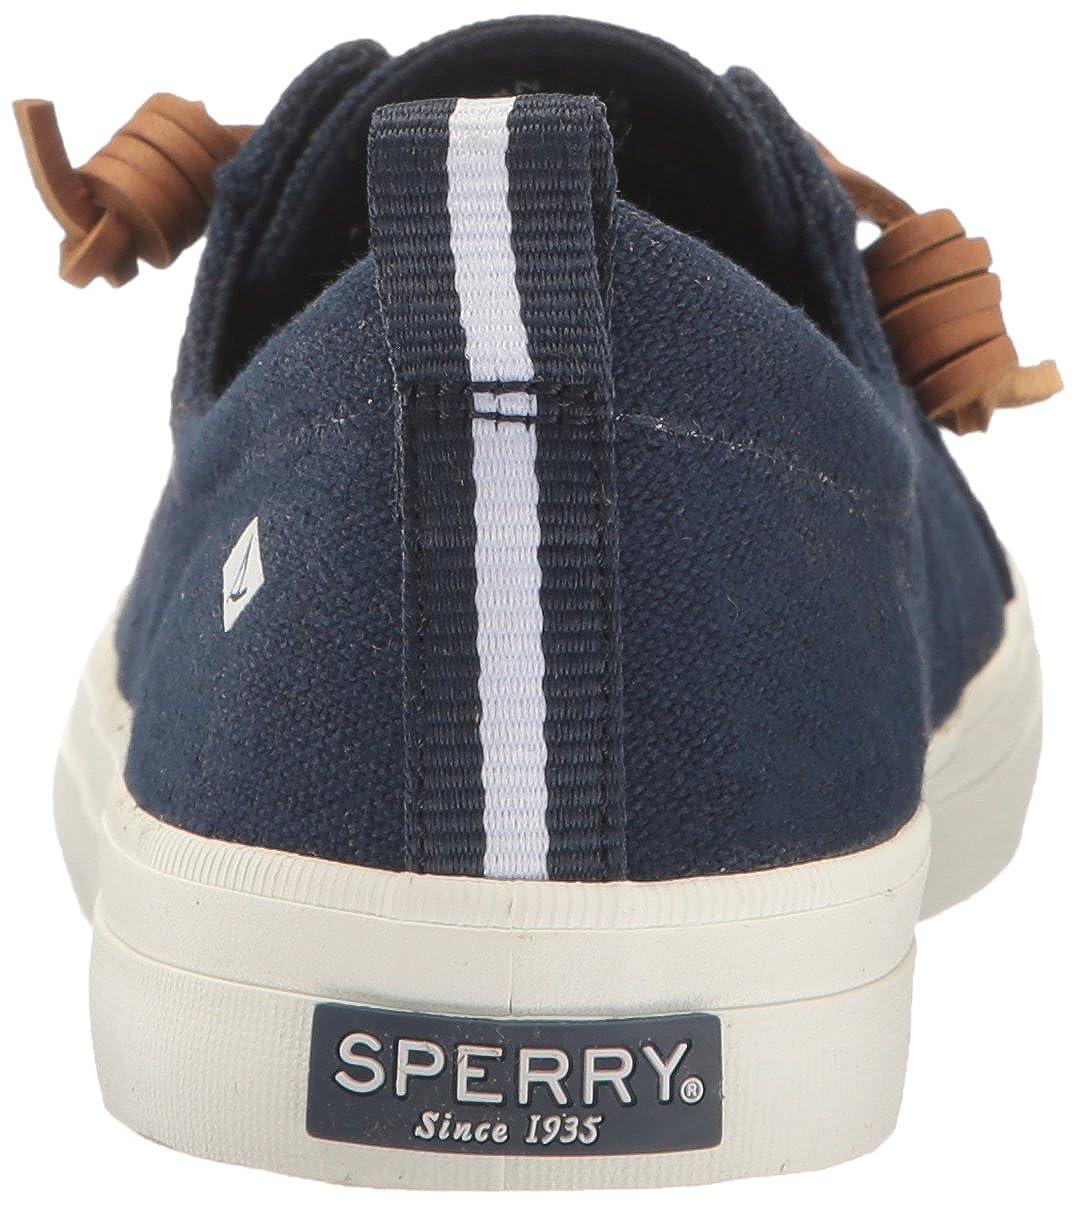 Sider Top Crest FemmeChaussures Et Sperry VibeBaskets wXNZOn0P8k